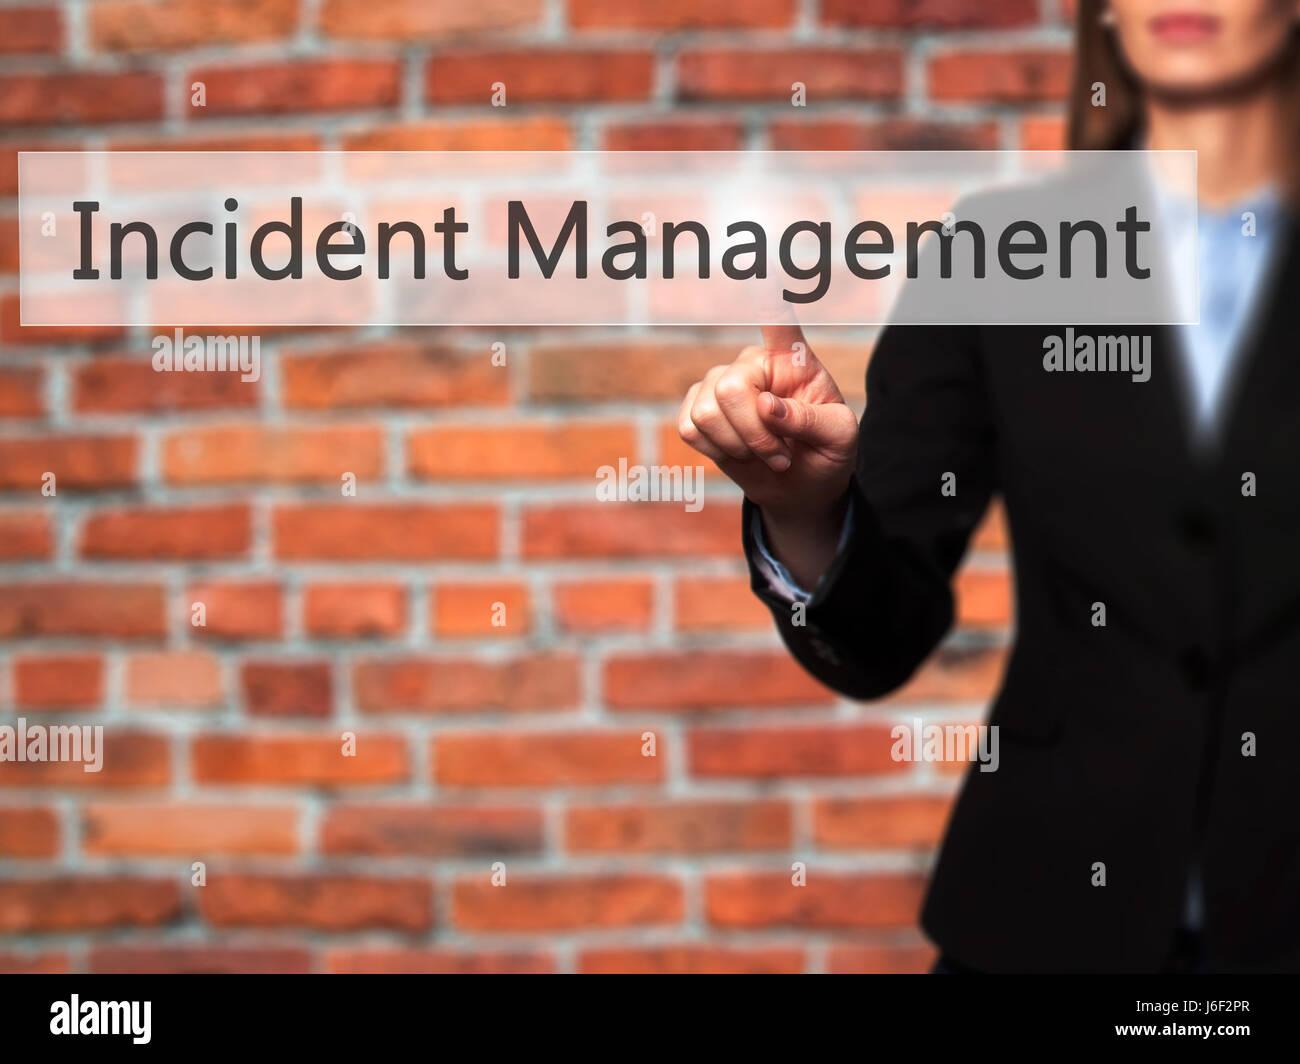 Incident Management Stock Photos & Incident Management ...